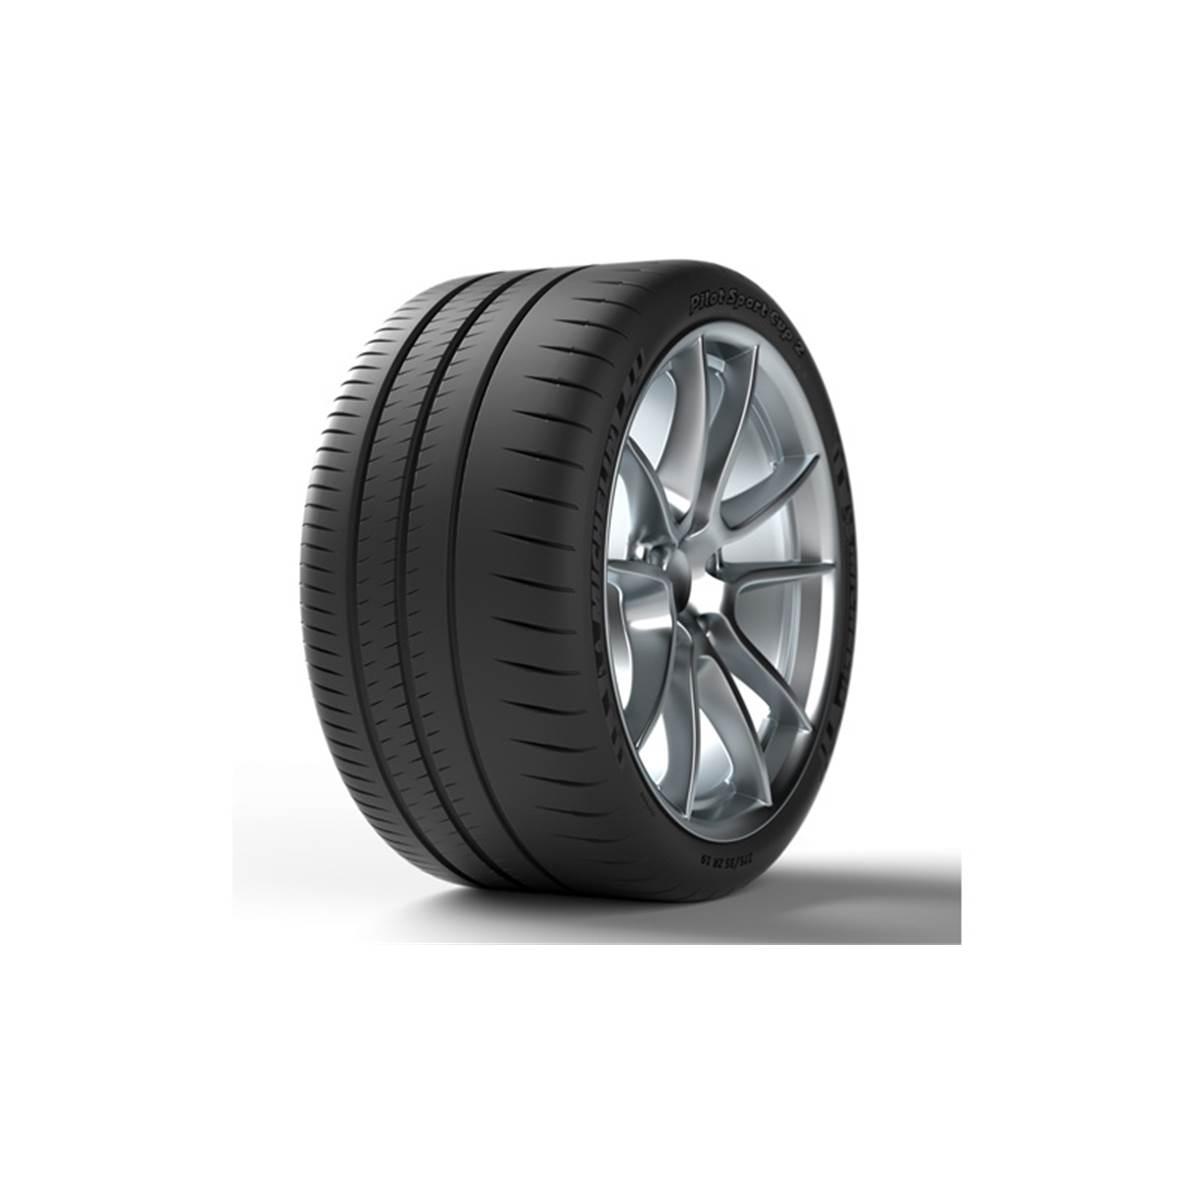 Pneu Michelin 265/35R20 99Y Pilot Sport Cup 2 XL